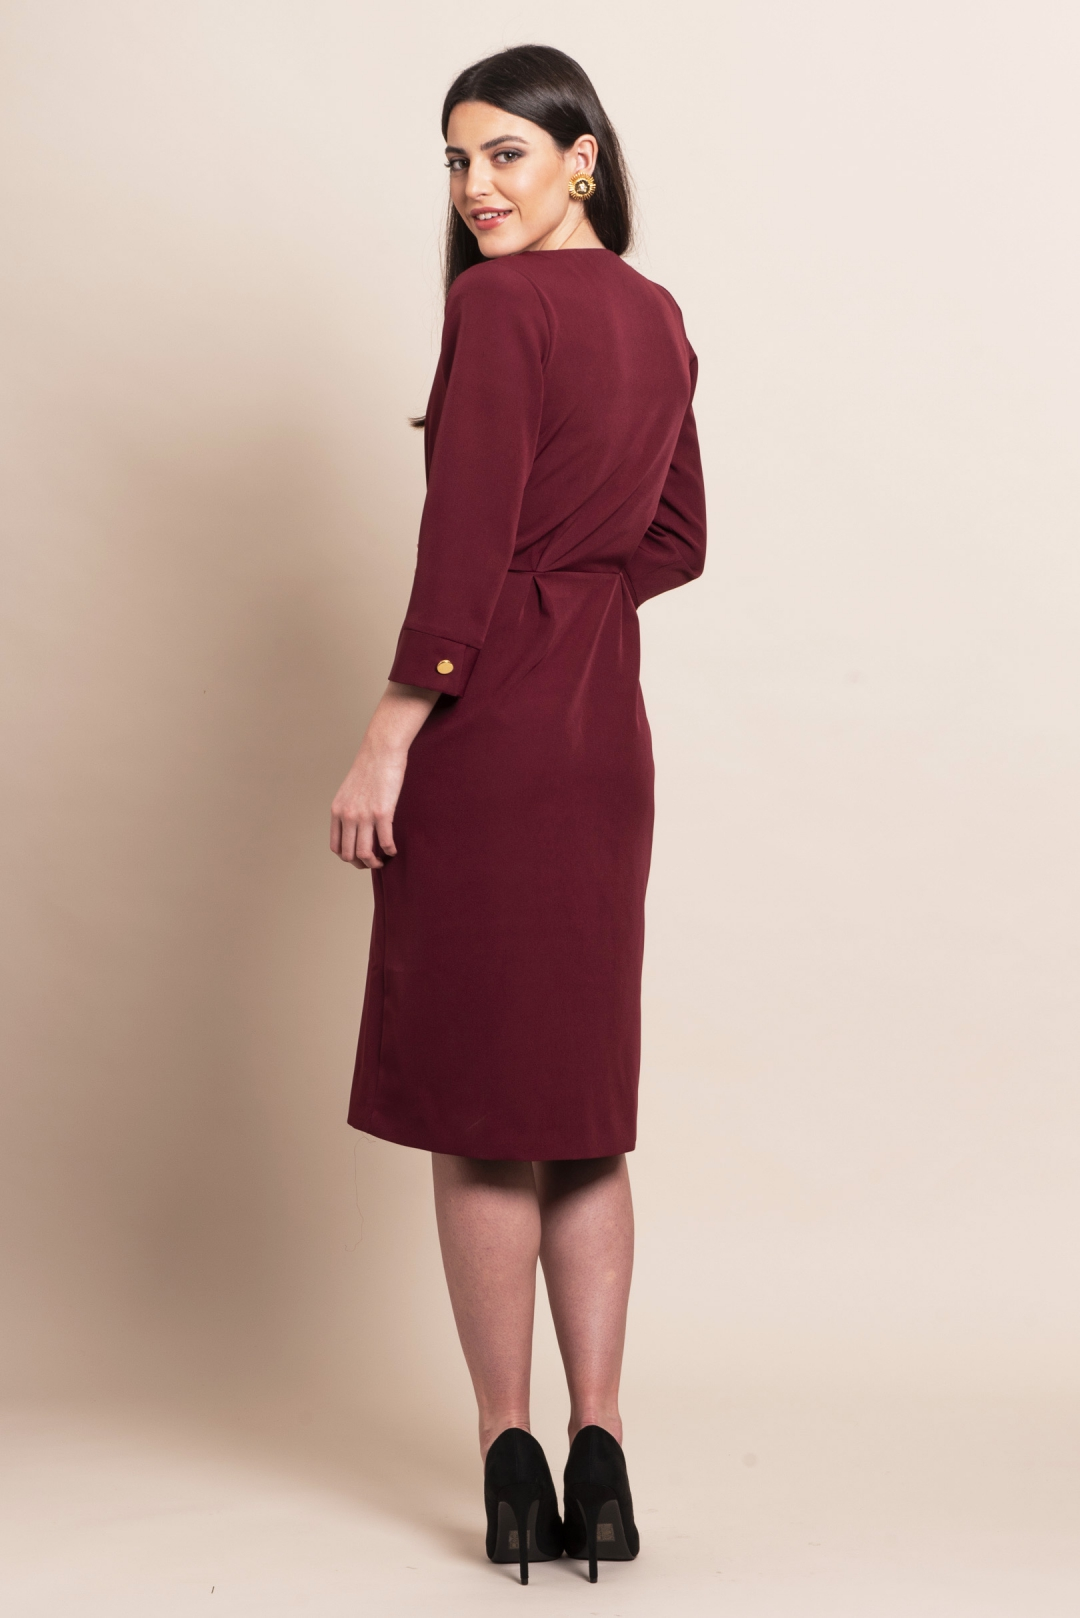 left - Vestido Escarlata Burgundy